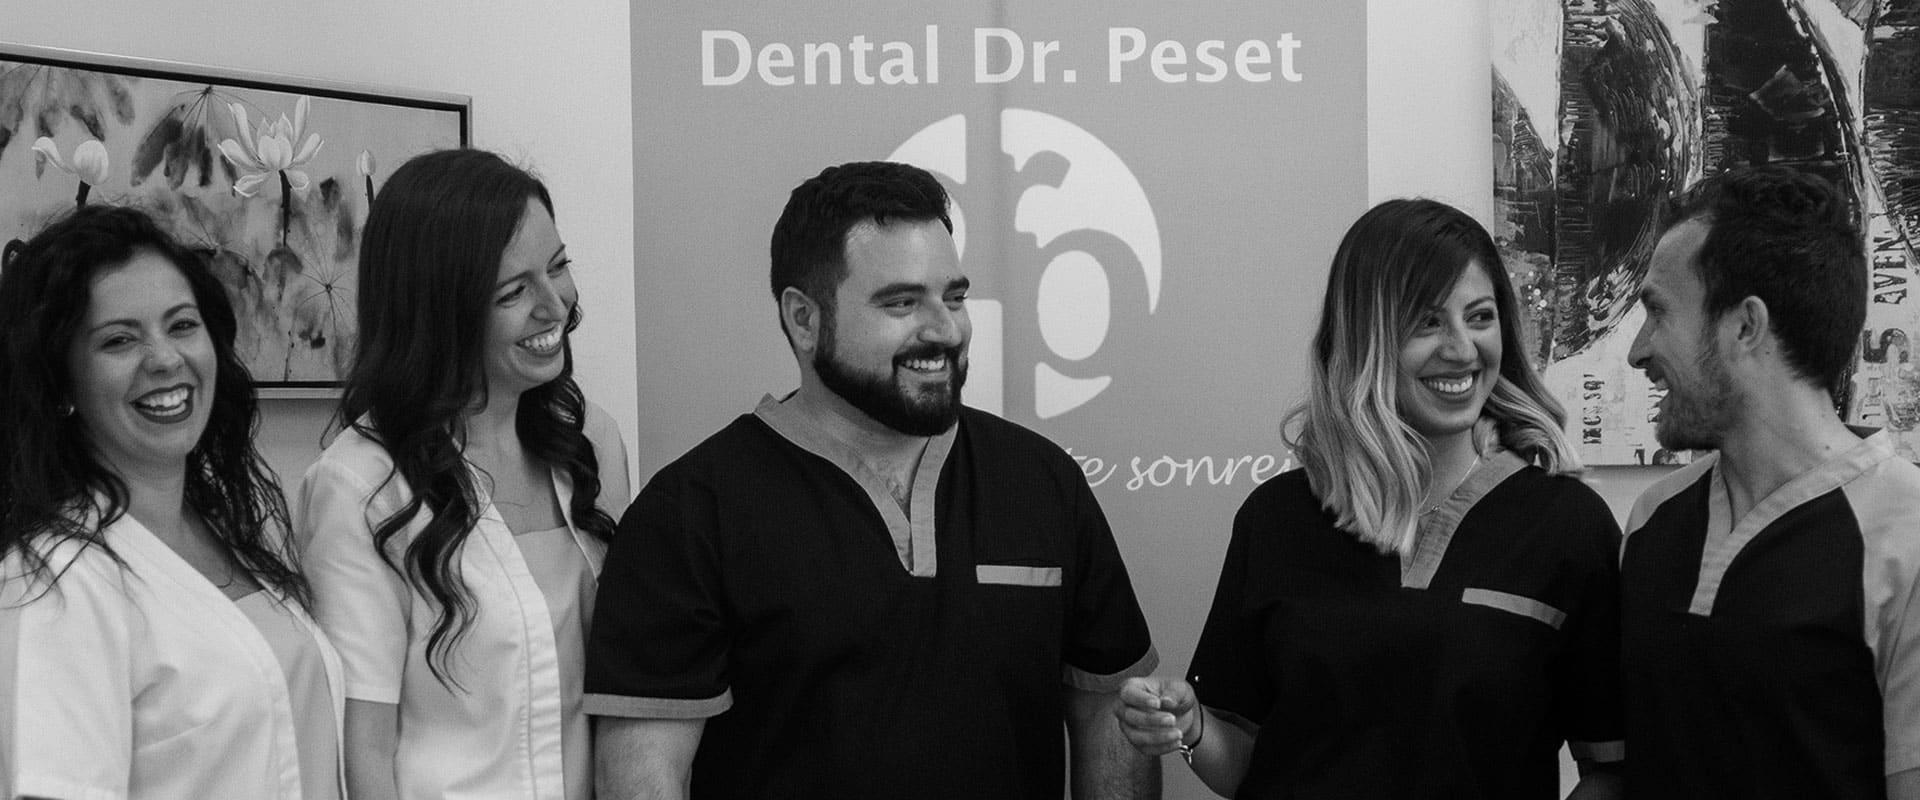 Clínica Dental Dr. Peset en Valencia